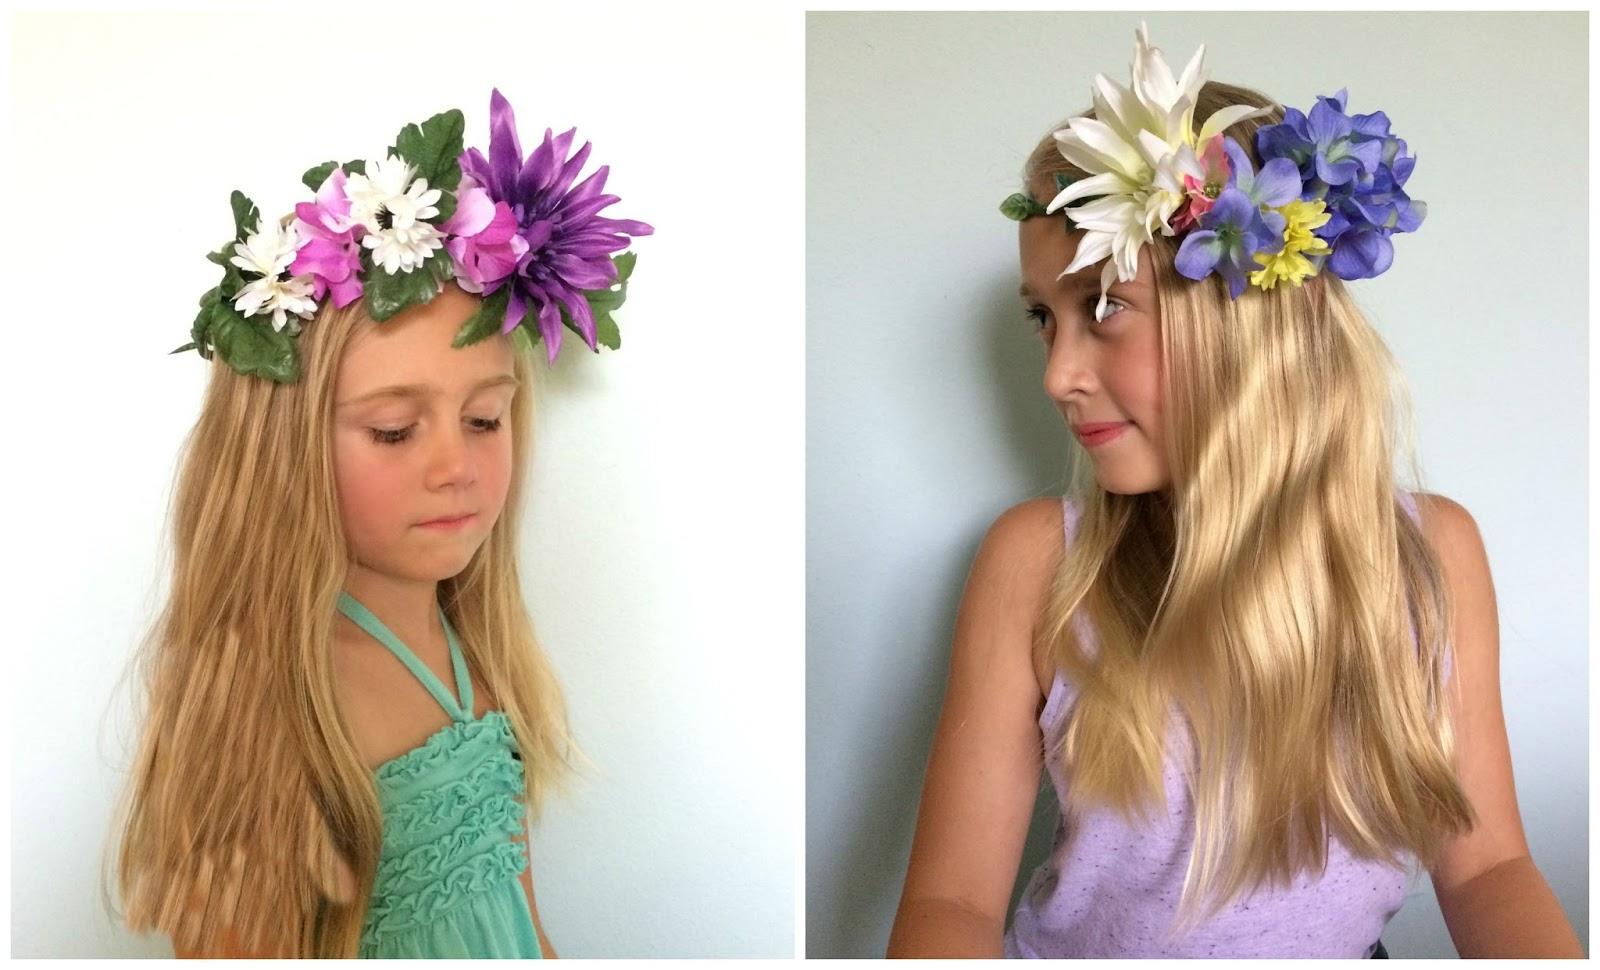 Crafty Texas Girls Diy How To Make Flower Crowns